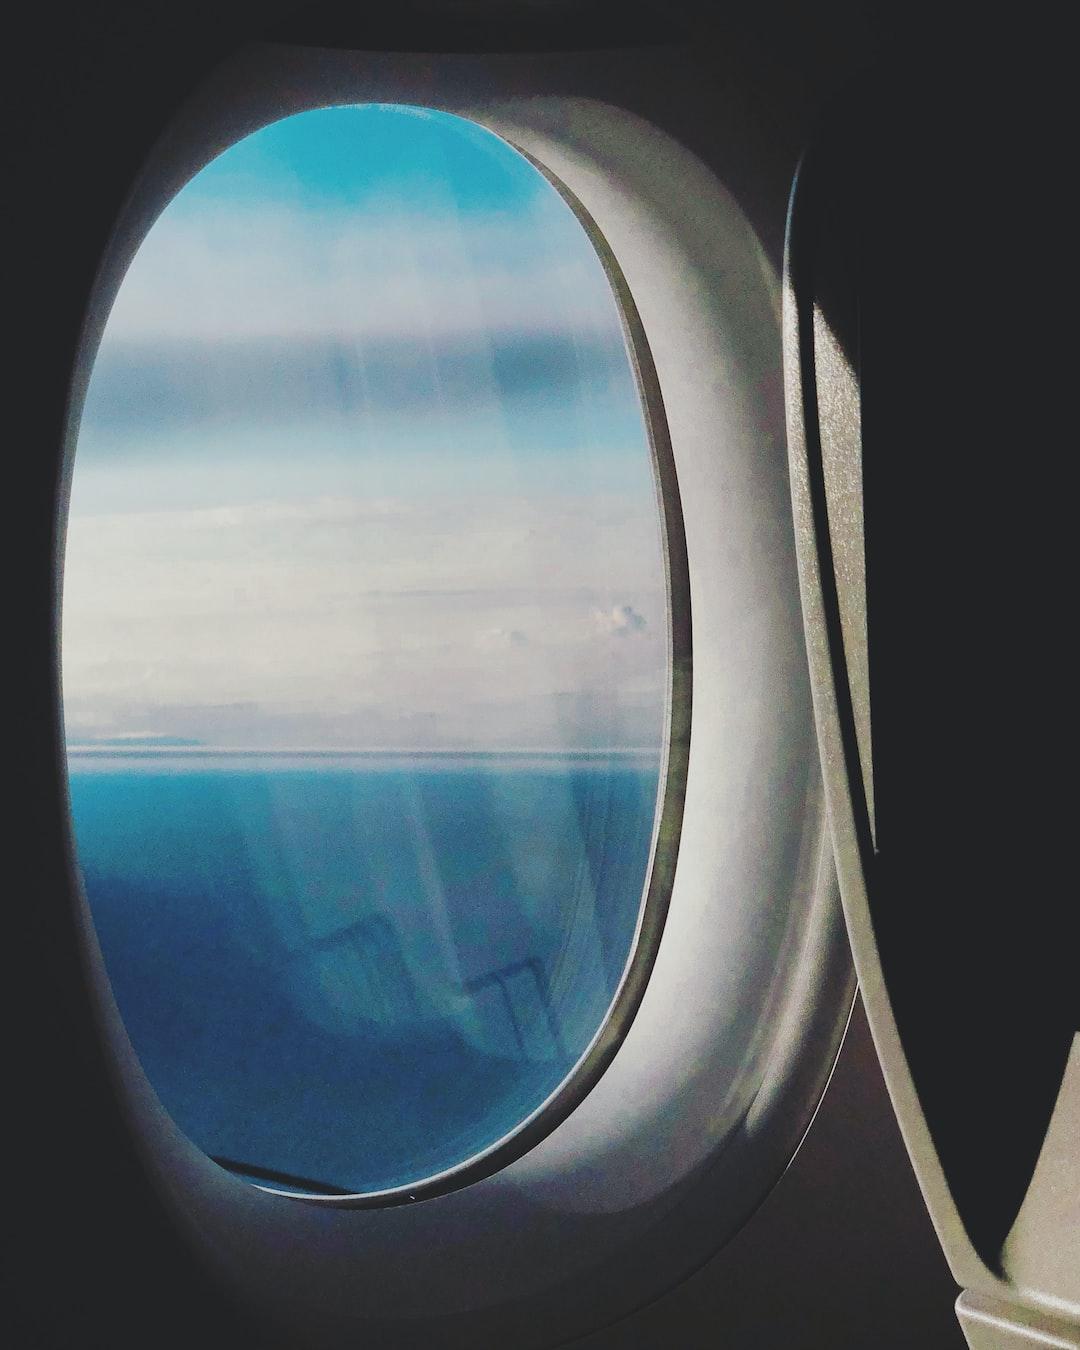 In an aeroplane over the sea.